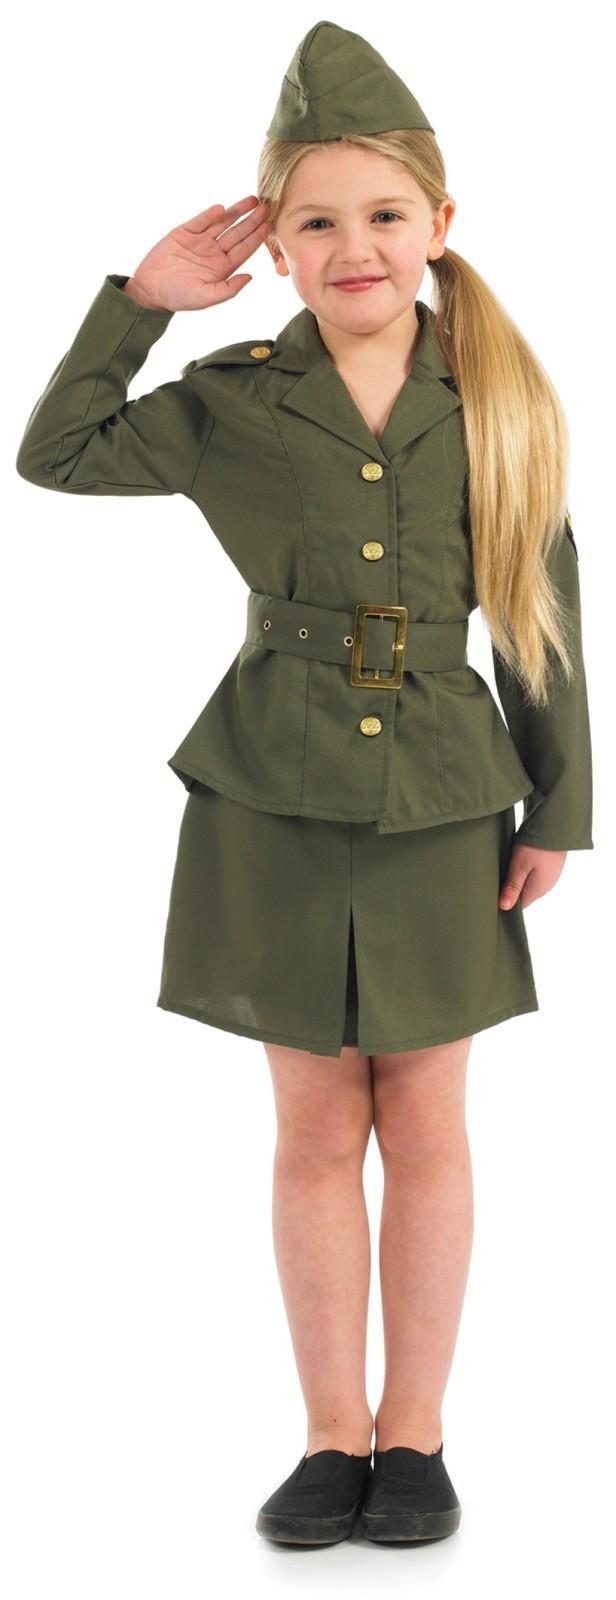 Girls-Ww2-Army-Girl-Costume-For-Military-Soldier-  sc 1 st  eBay & Girls Ww2 Army Girl Costume For Military Soldier Fancy Dress Kids ...